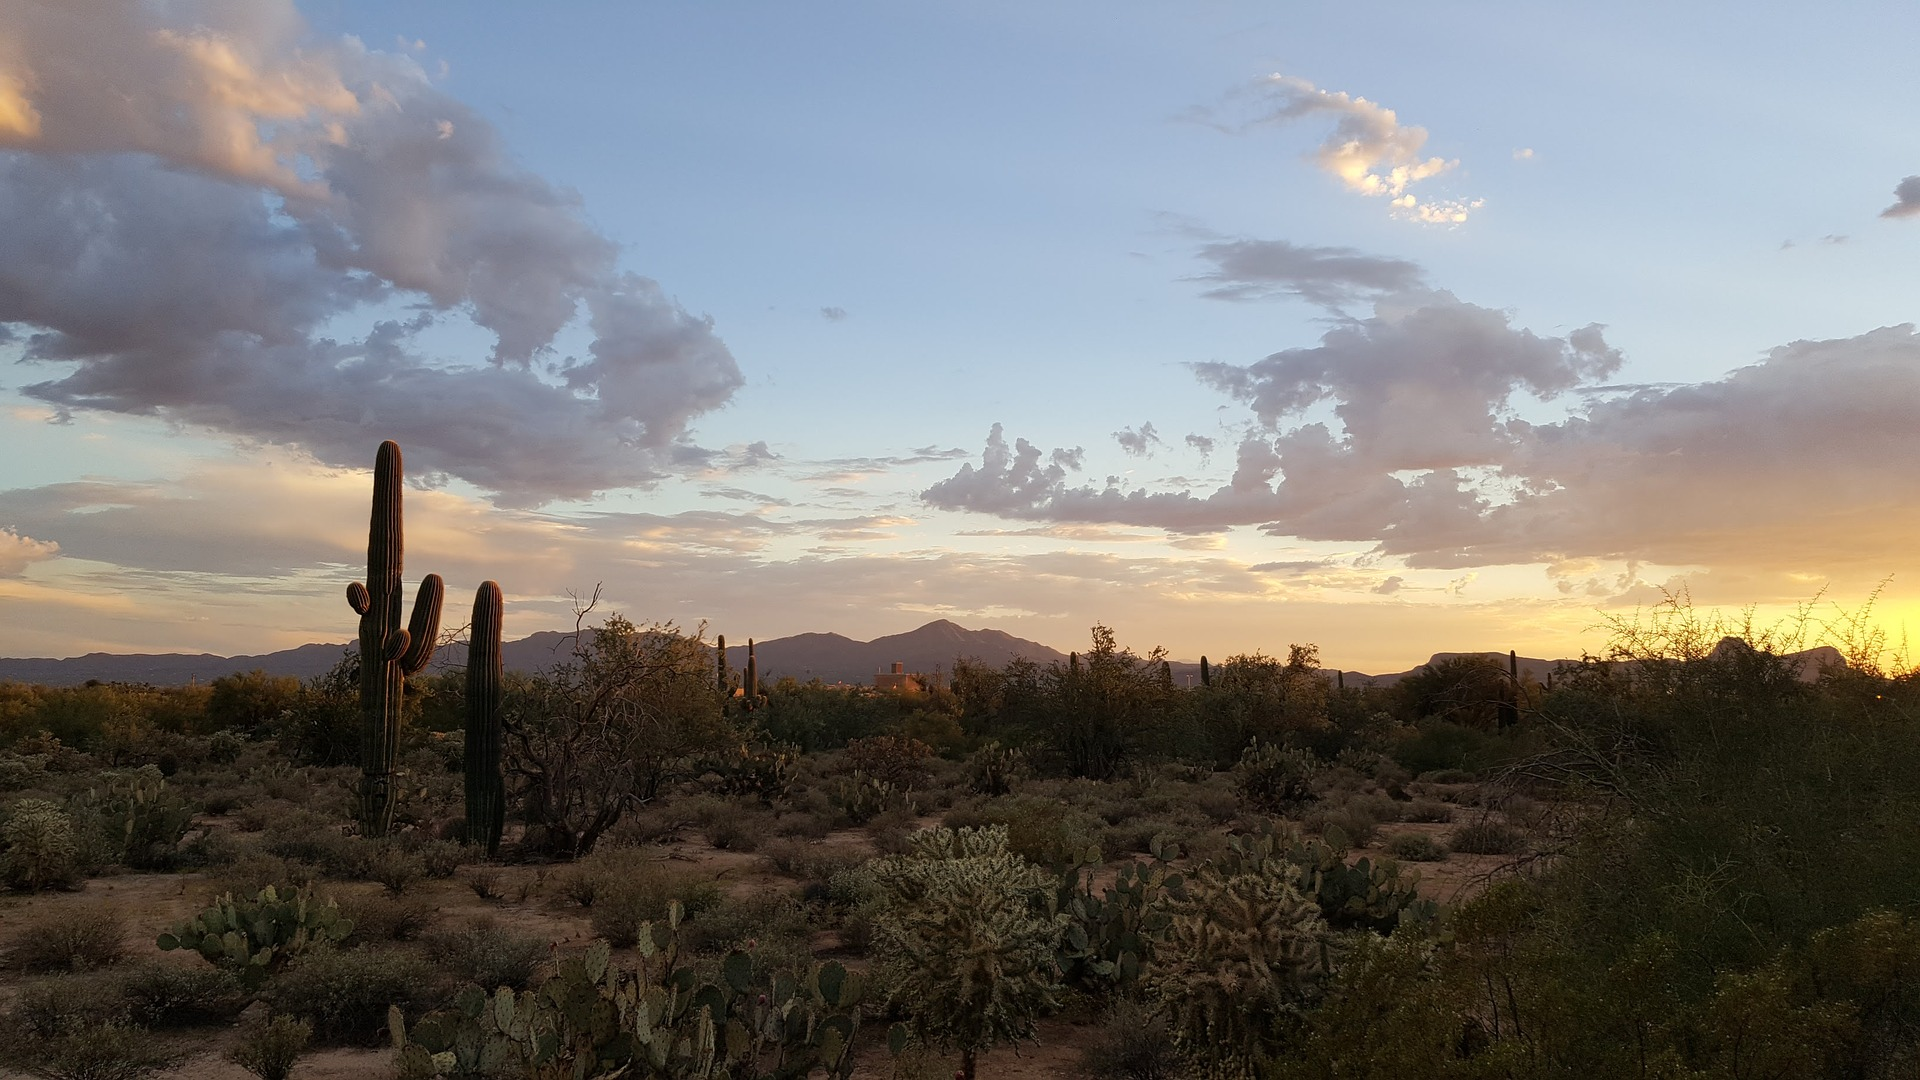 saguaro-2714996_1920.jpg